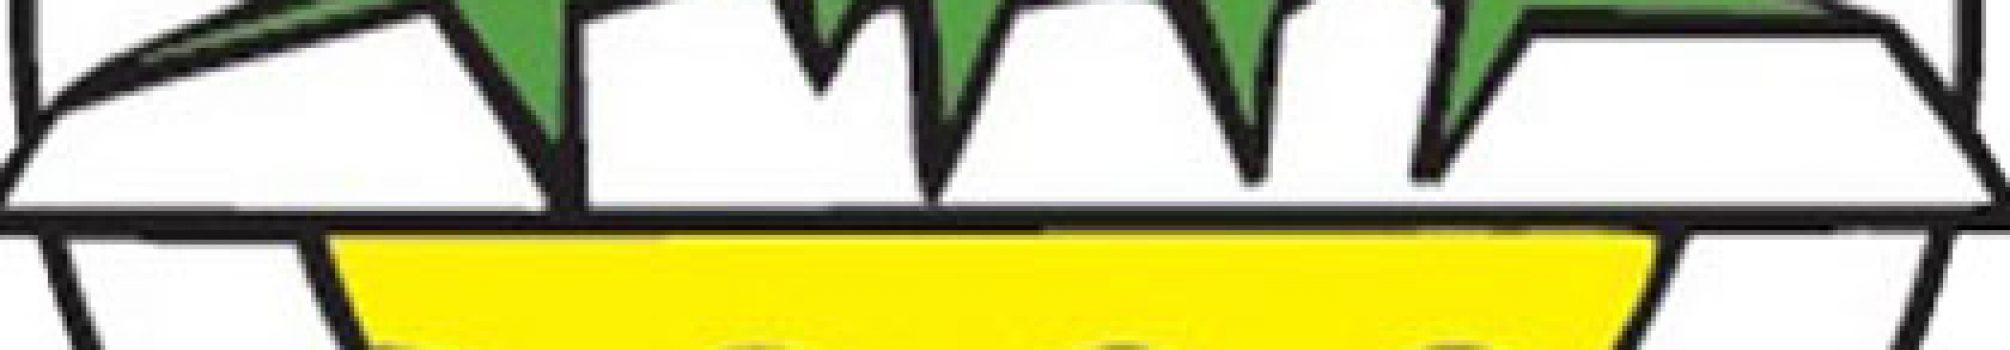 dover-badge